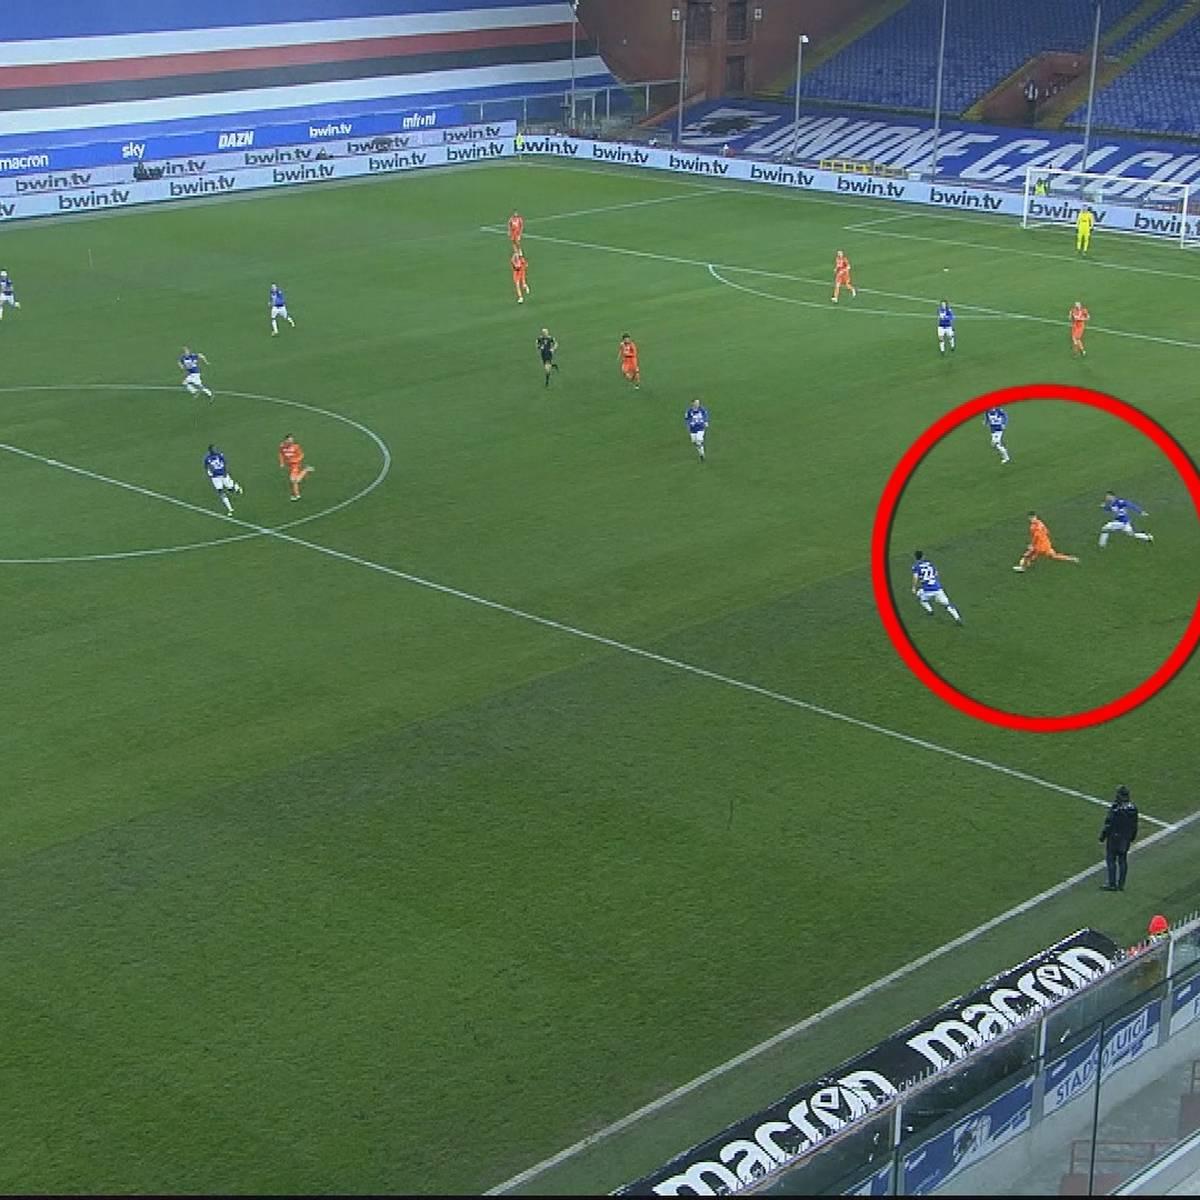 CR7-Traumpass! Ronaldo filetiert Genua-Abwehr